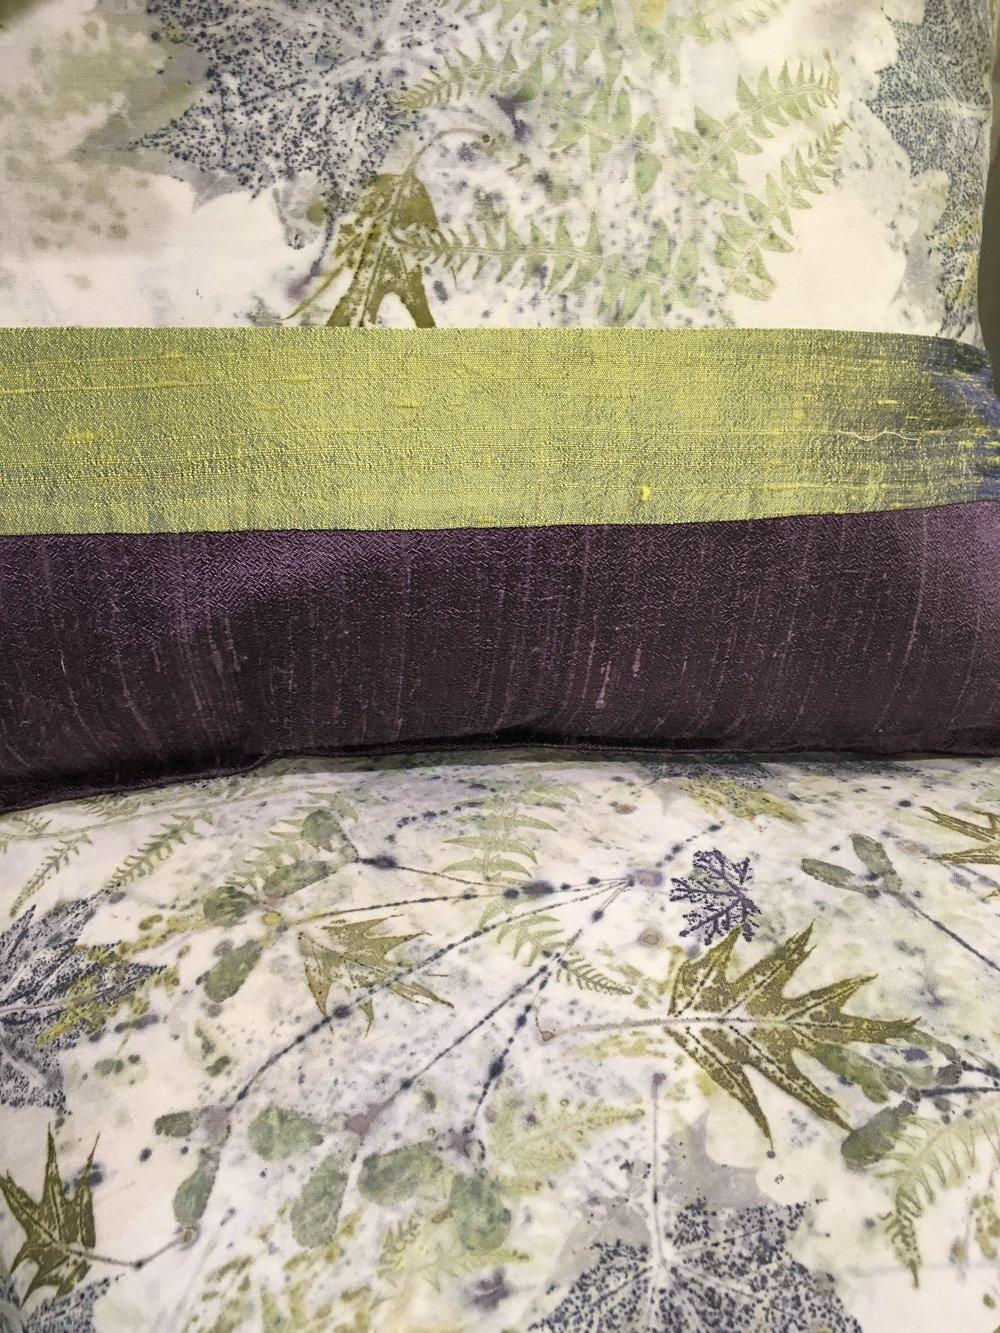 Silk broadcloth printed with bracken fern, oak leaves, crimson Norway maple, red swamp maple samaras, bordered with Dupioni silk